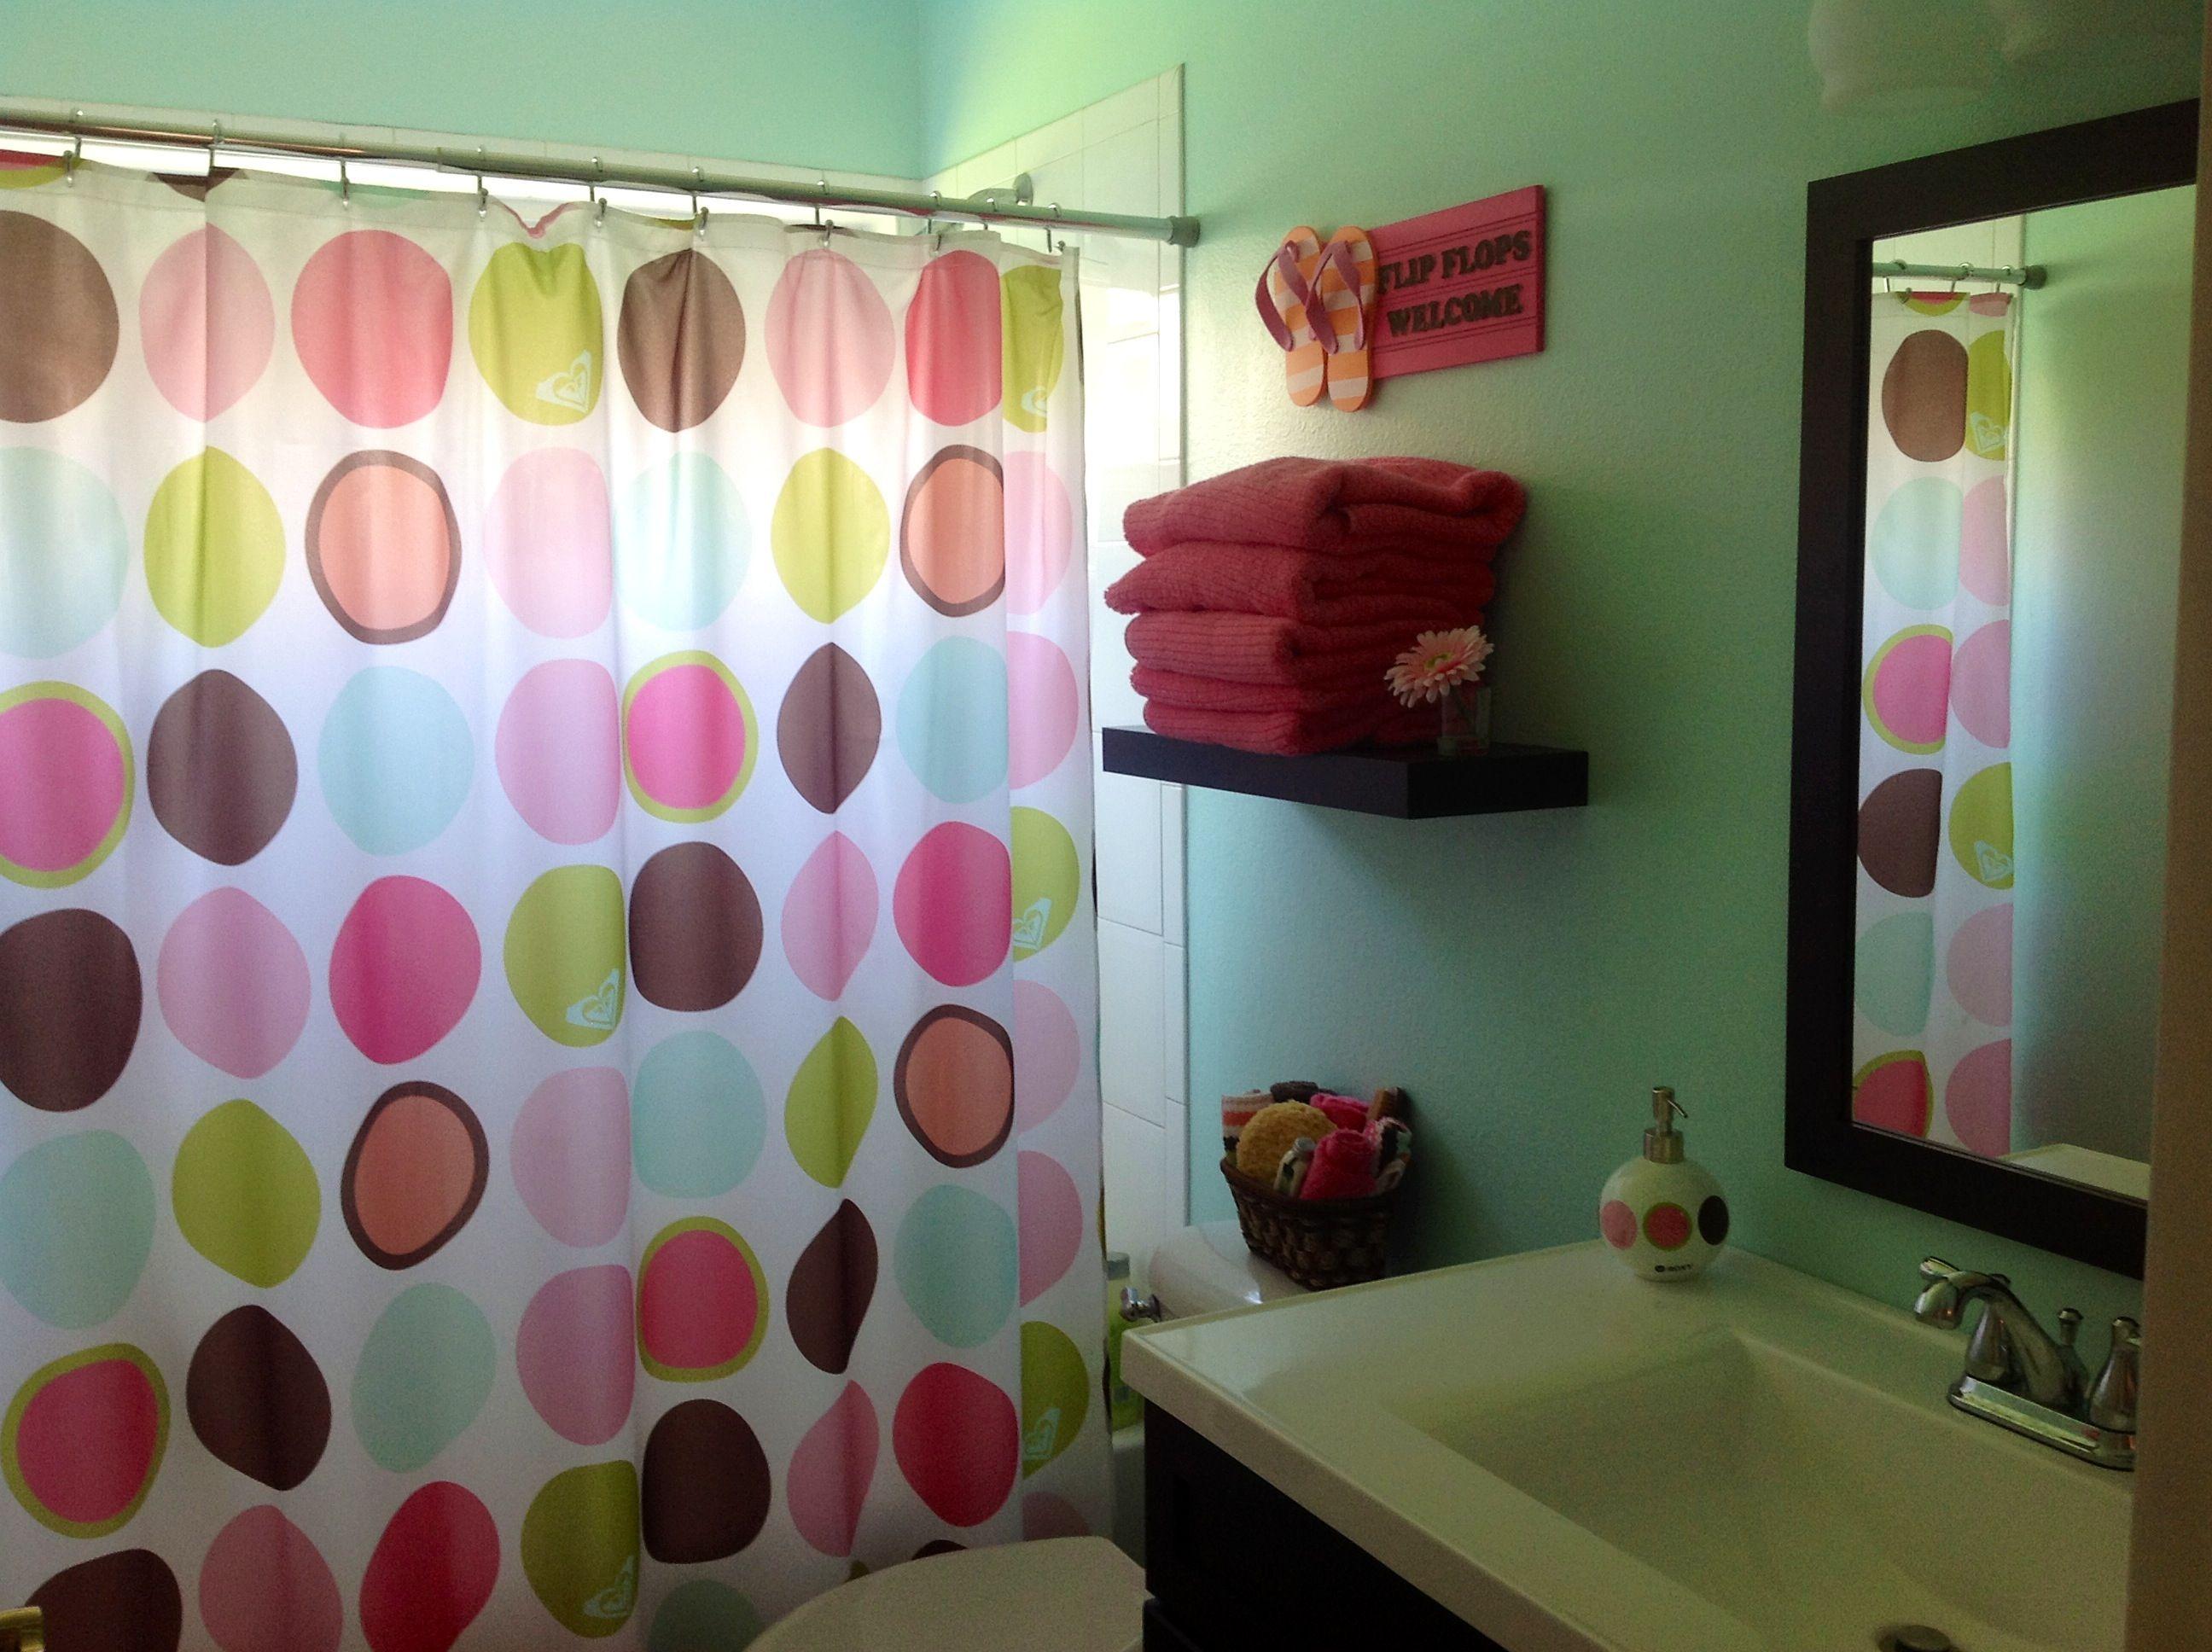 Shower curtains for girls - Girls Bathroom Shower Curtains Girls Bathroom Shower Curtains